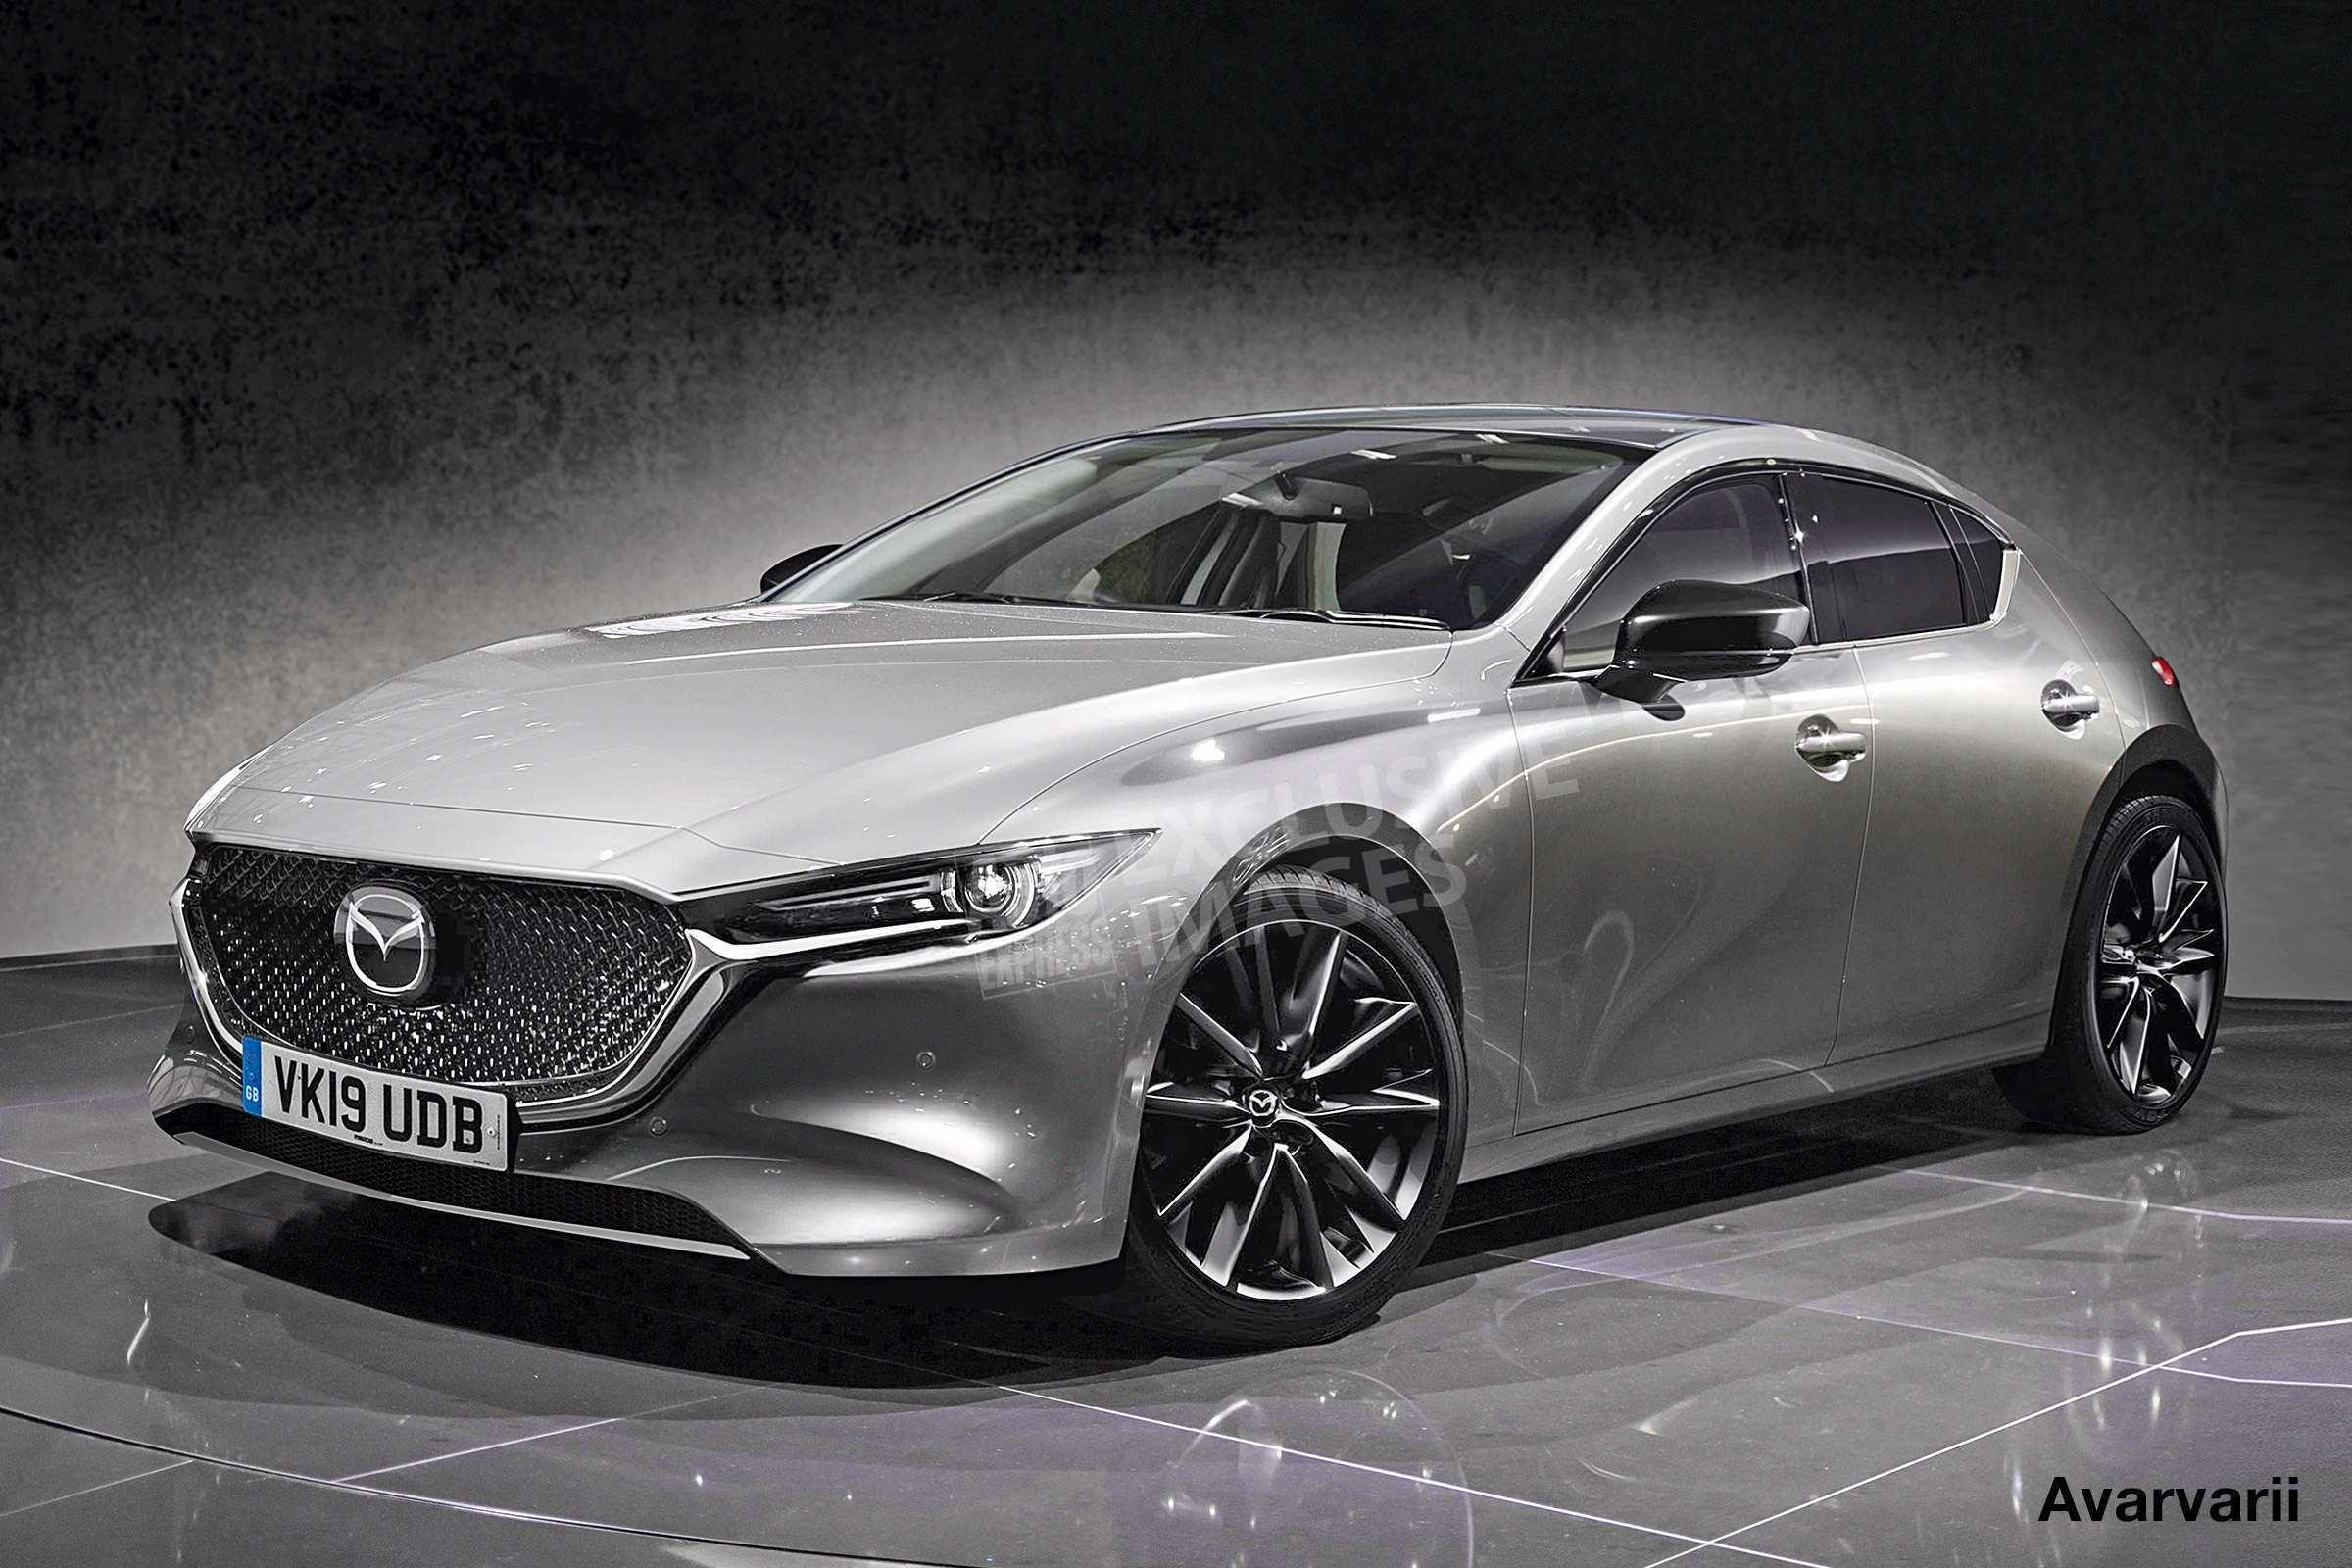 52 Concept of Mazda 3 2020 Hybrid Prices by Mazda 3 2020 Hybrid